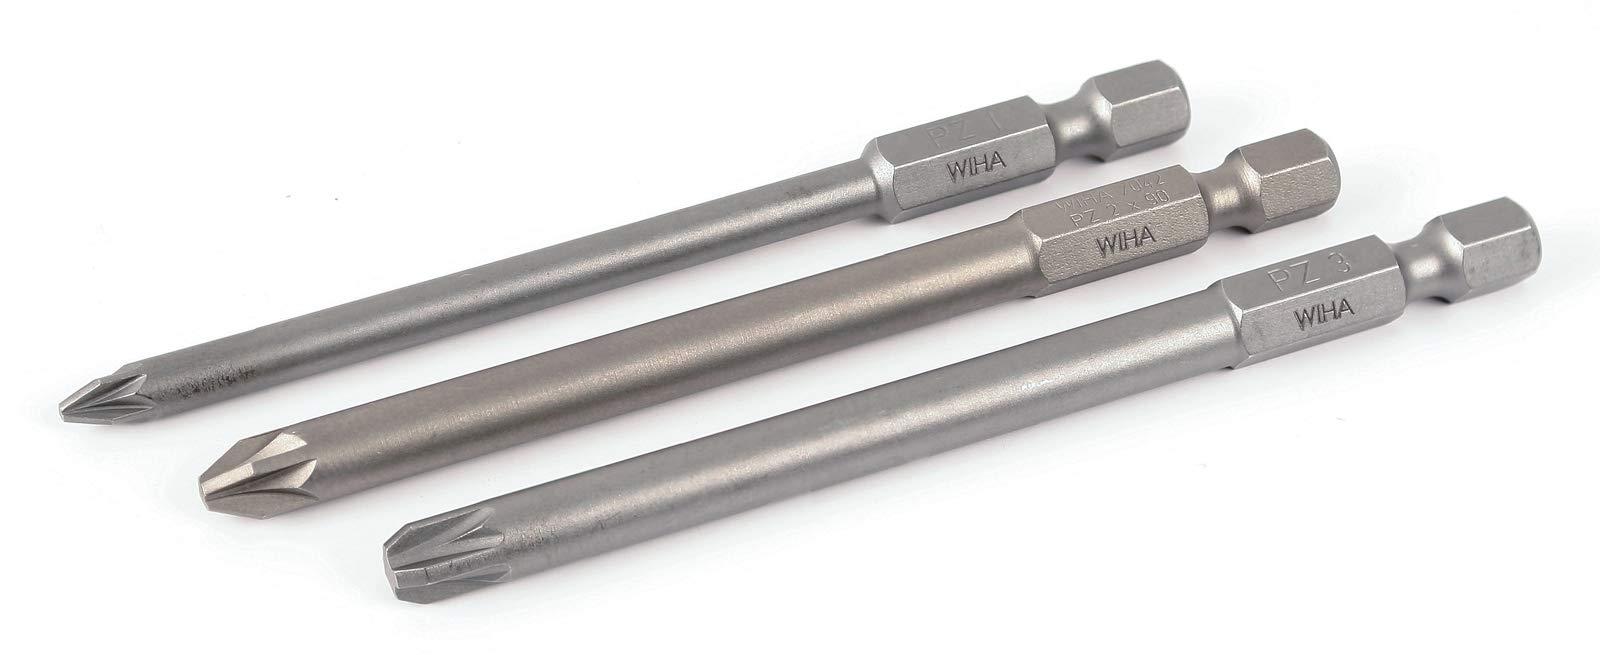 Wiha 76091 Pozidriv Power Blade 3 Pc. Set